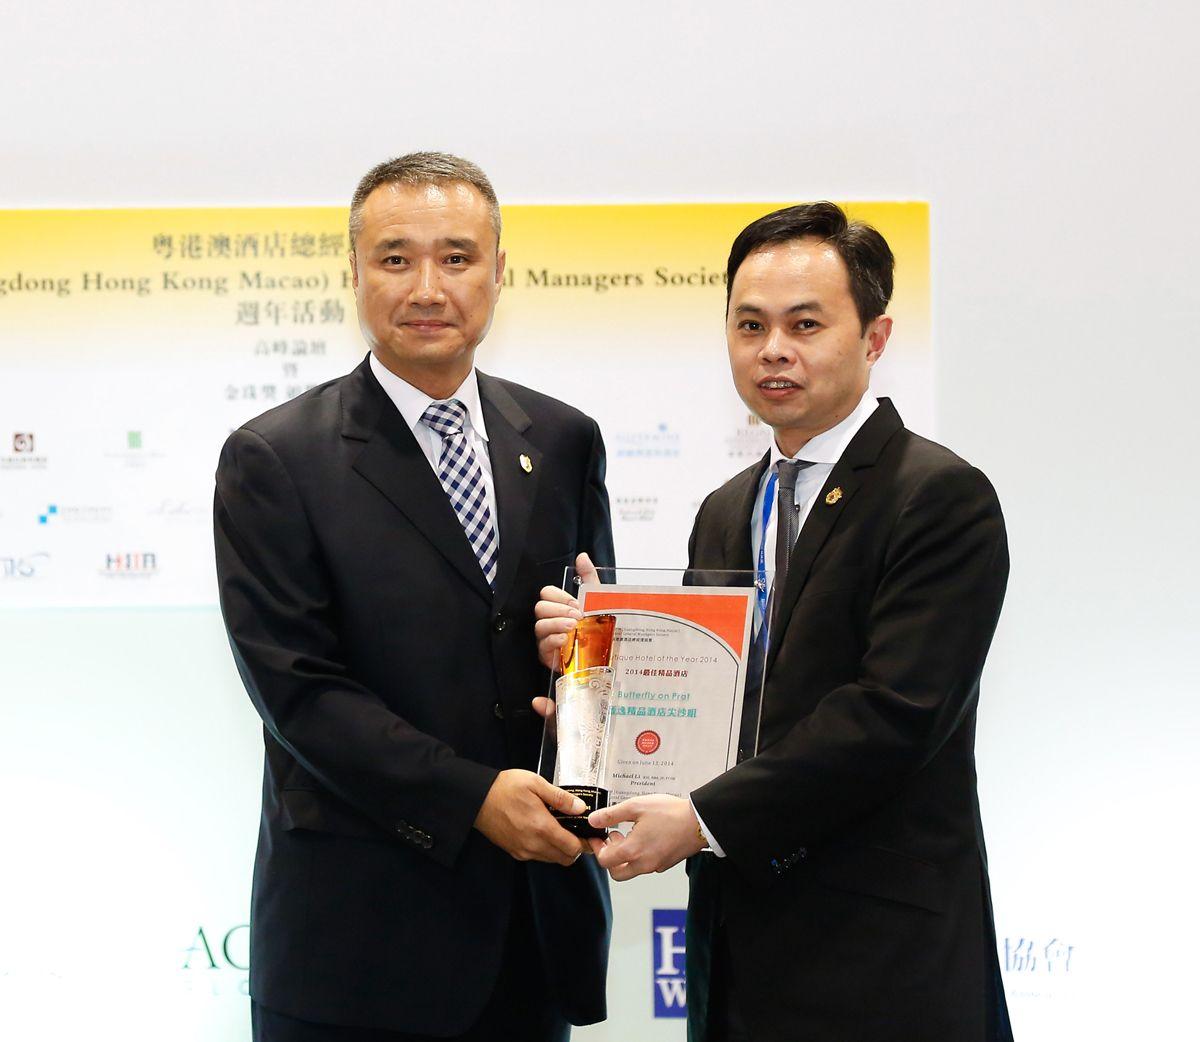 Butterfly on Prat - 2014 GHM Golden Pearl Award